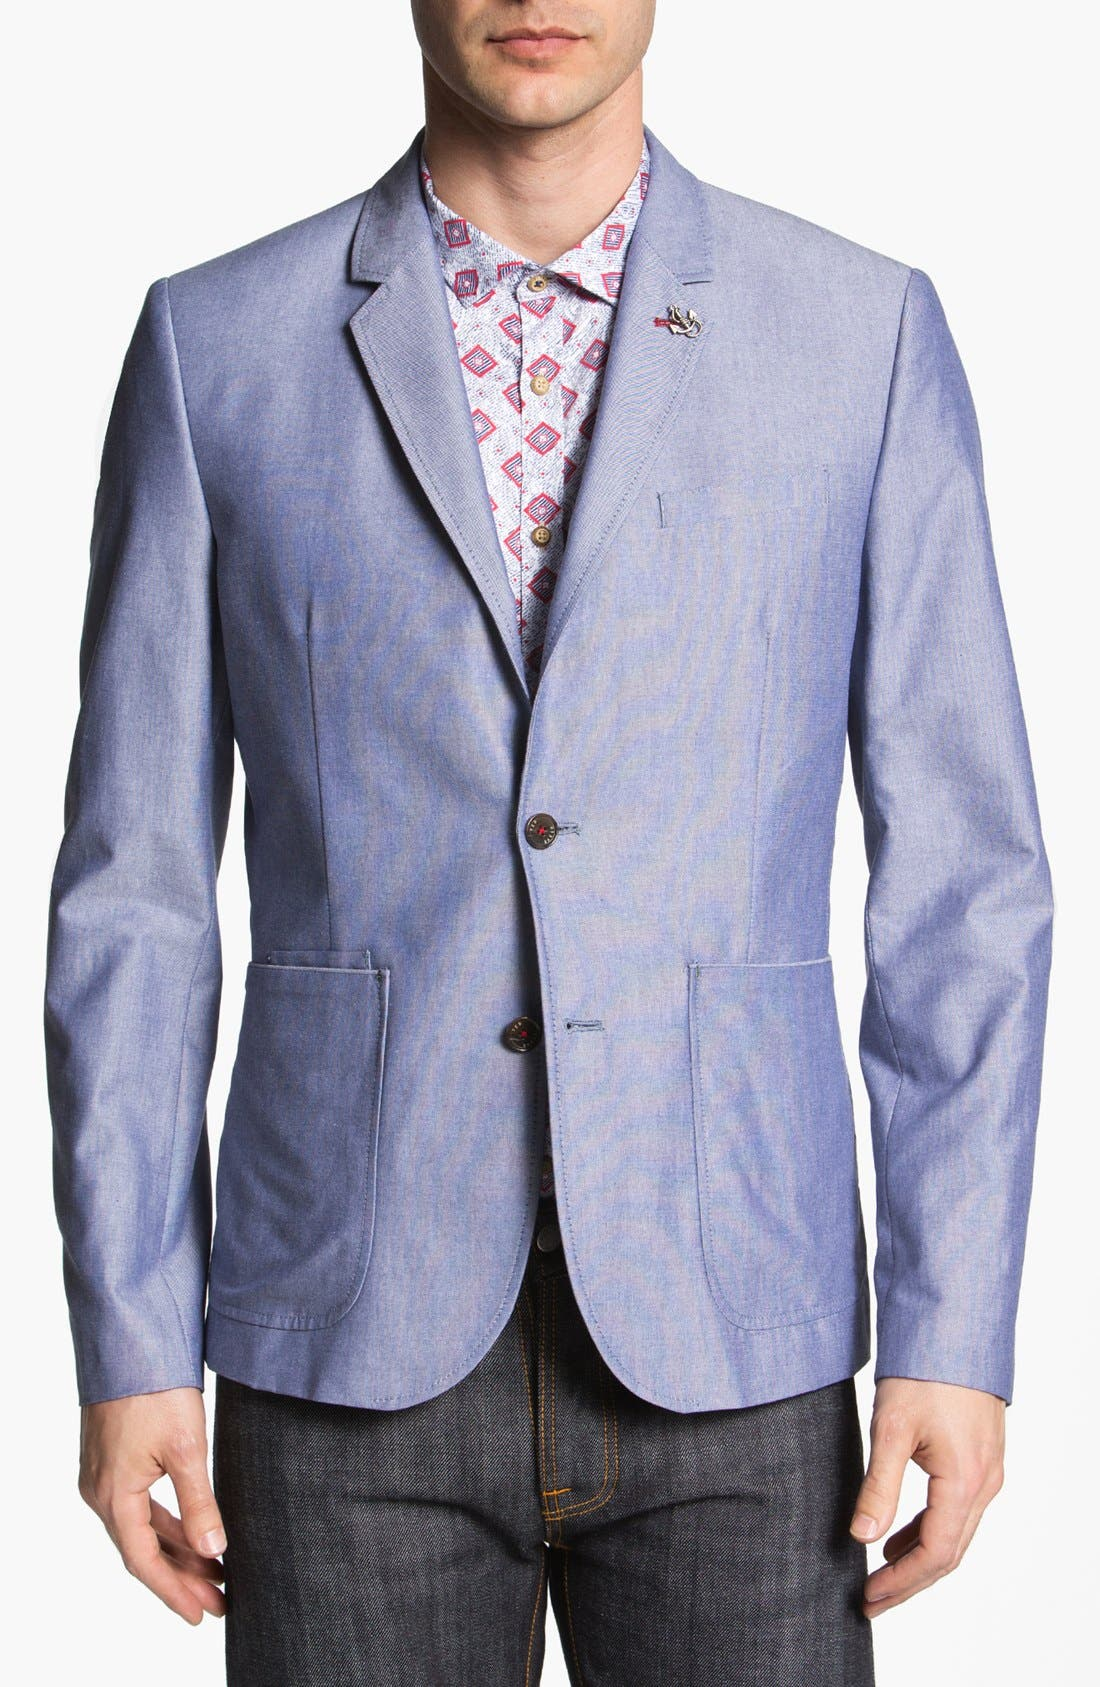 Alternate Image 1 Selected - Ted Baker London 'Pheejack' Cotton Blazer